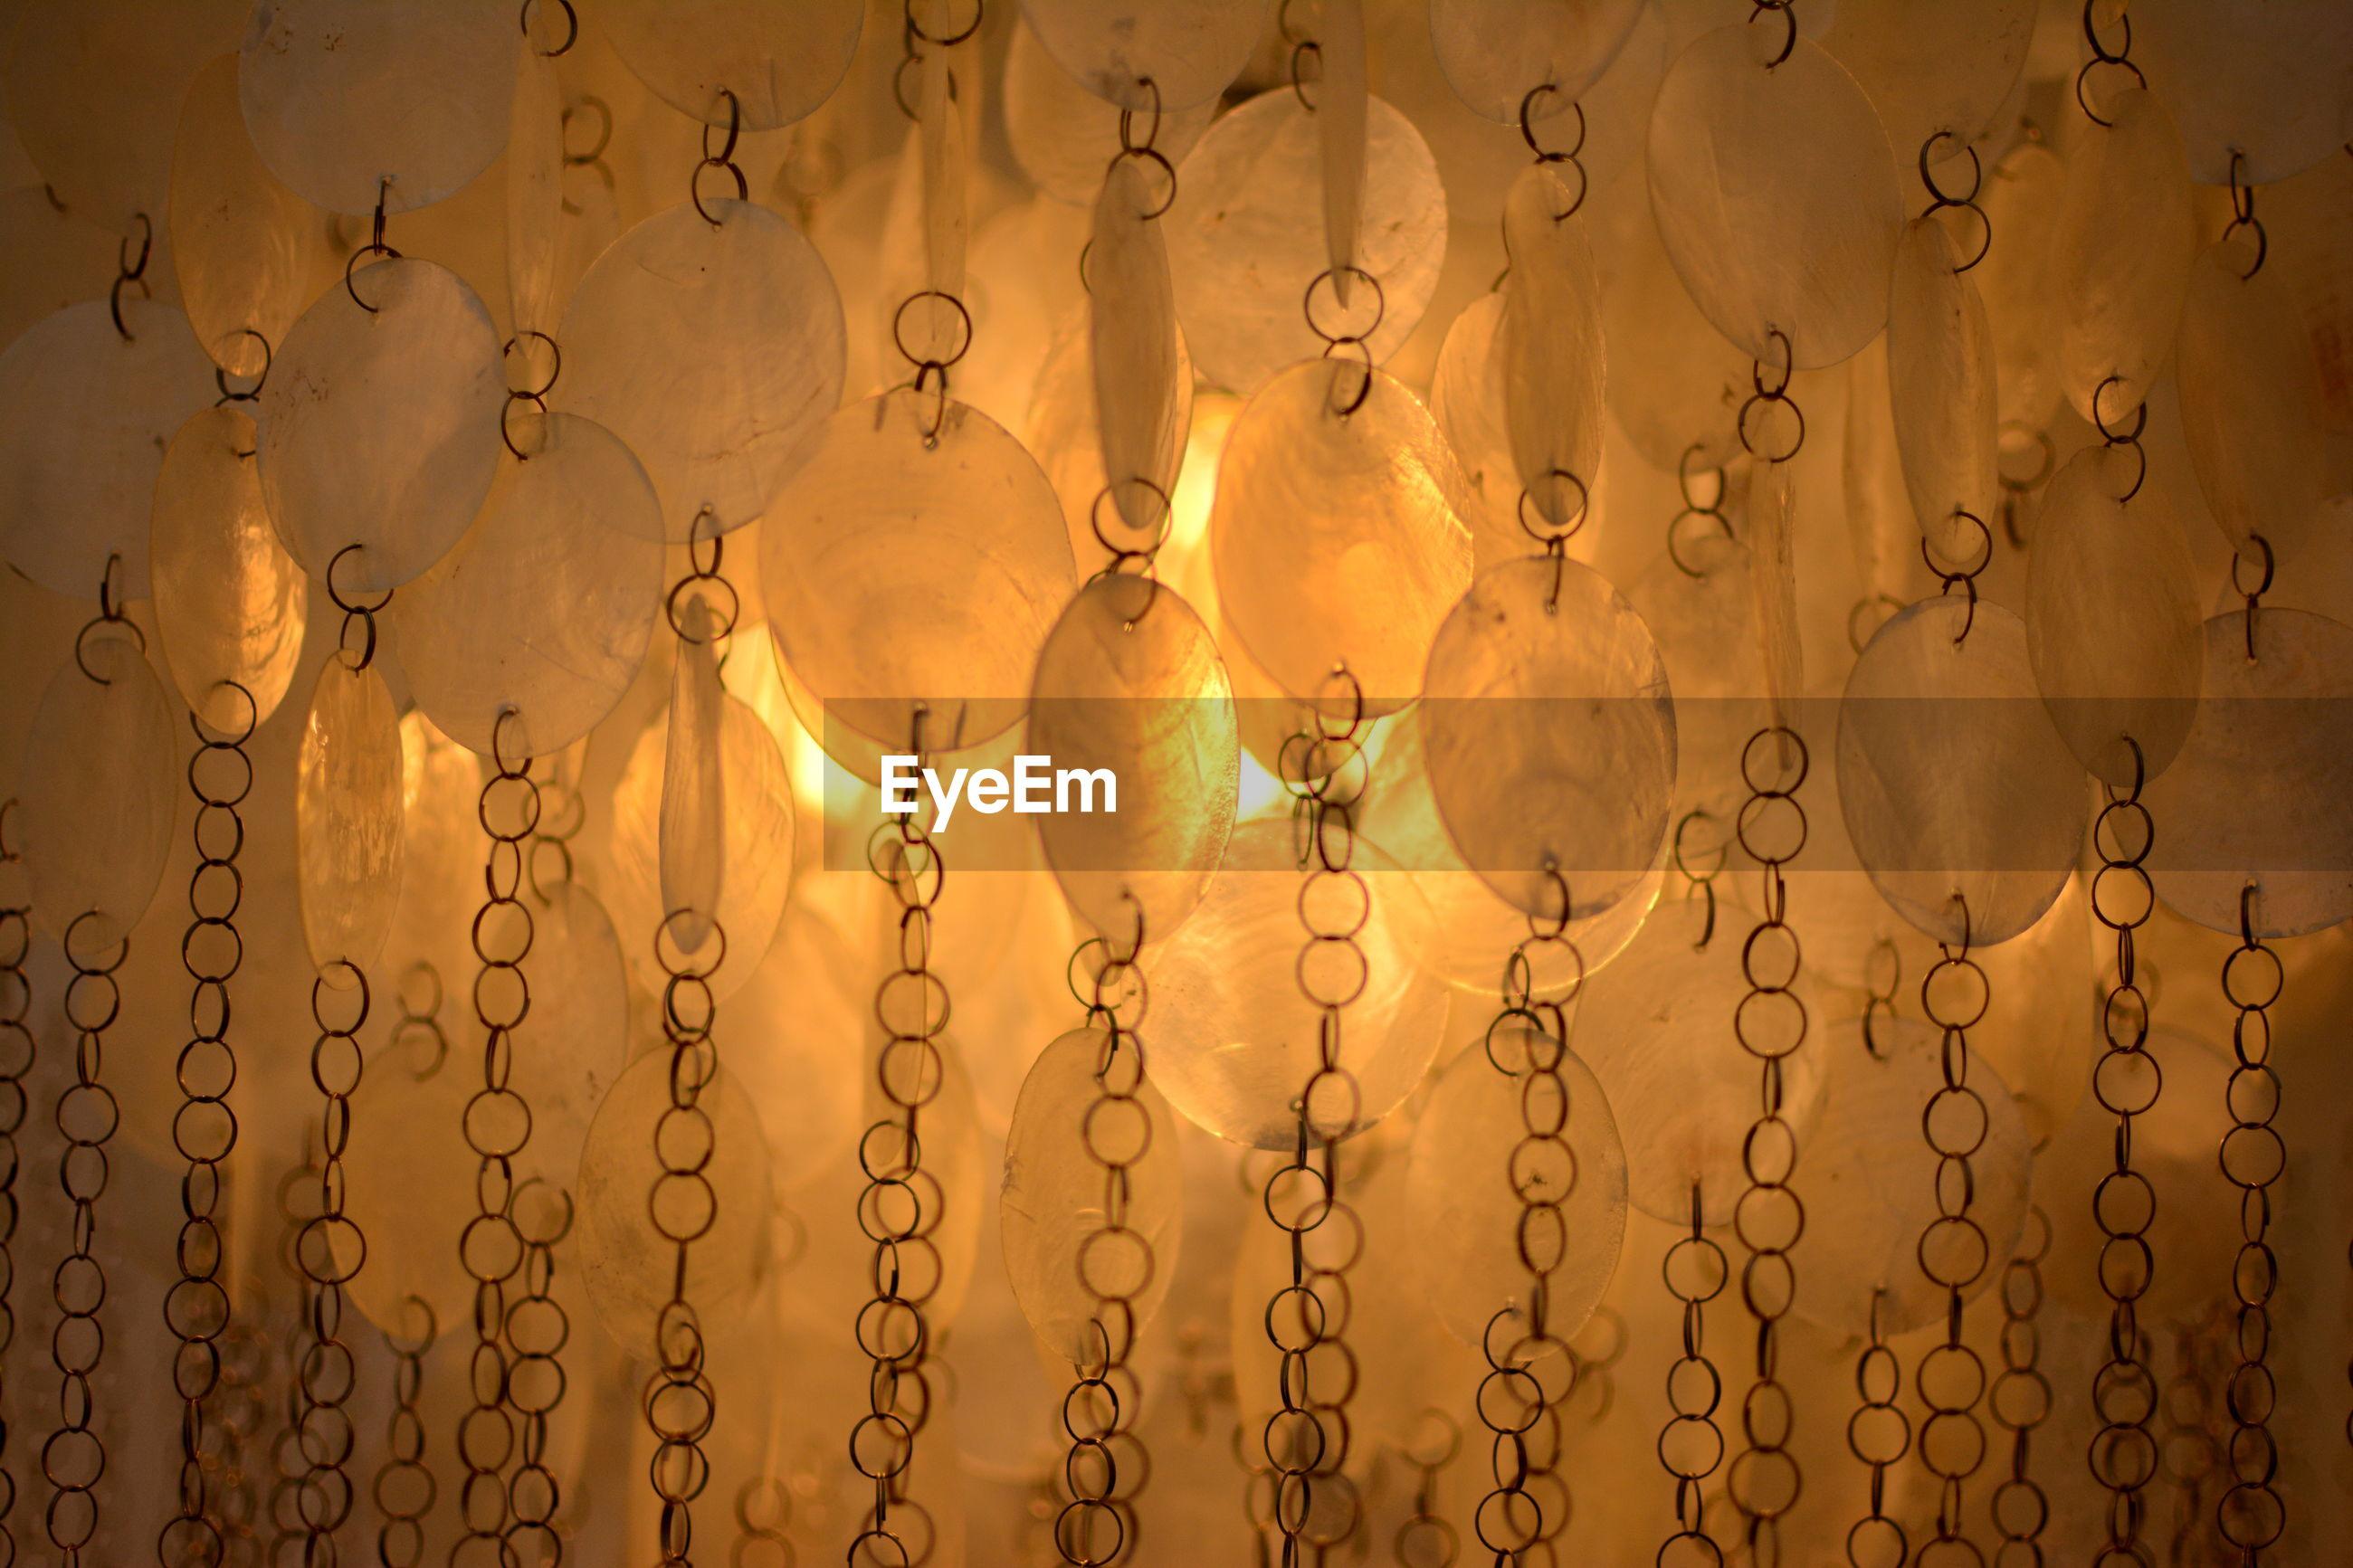 CLOSE-UP OF ILLUMINATED LIGHTING EQUIPMENT AGAINST WATER